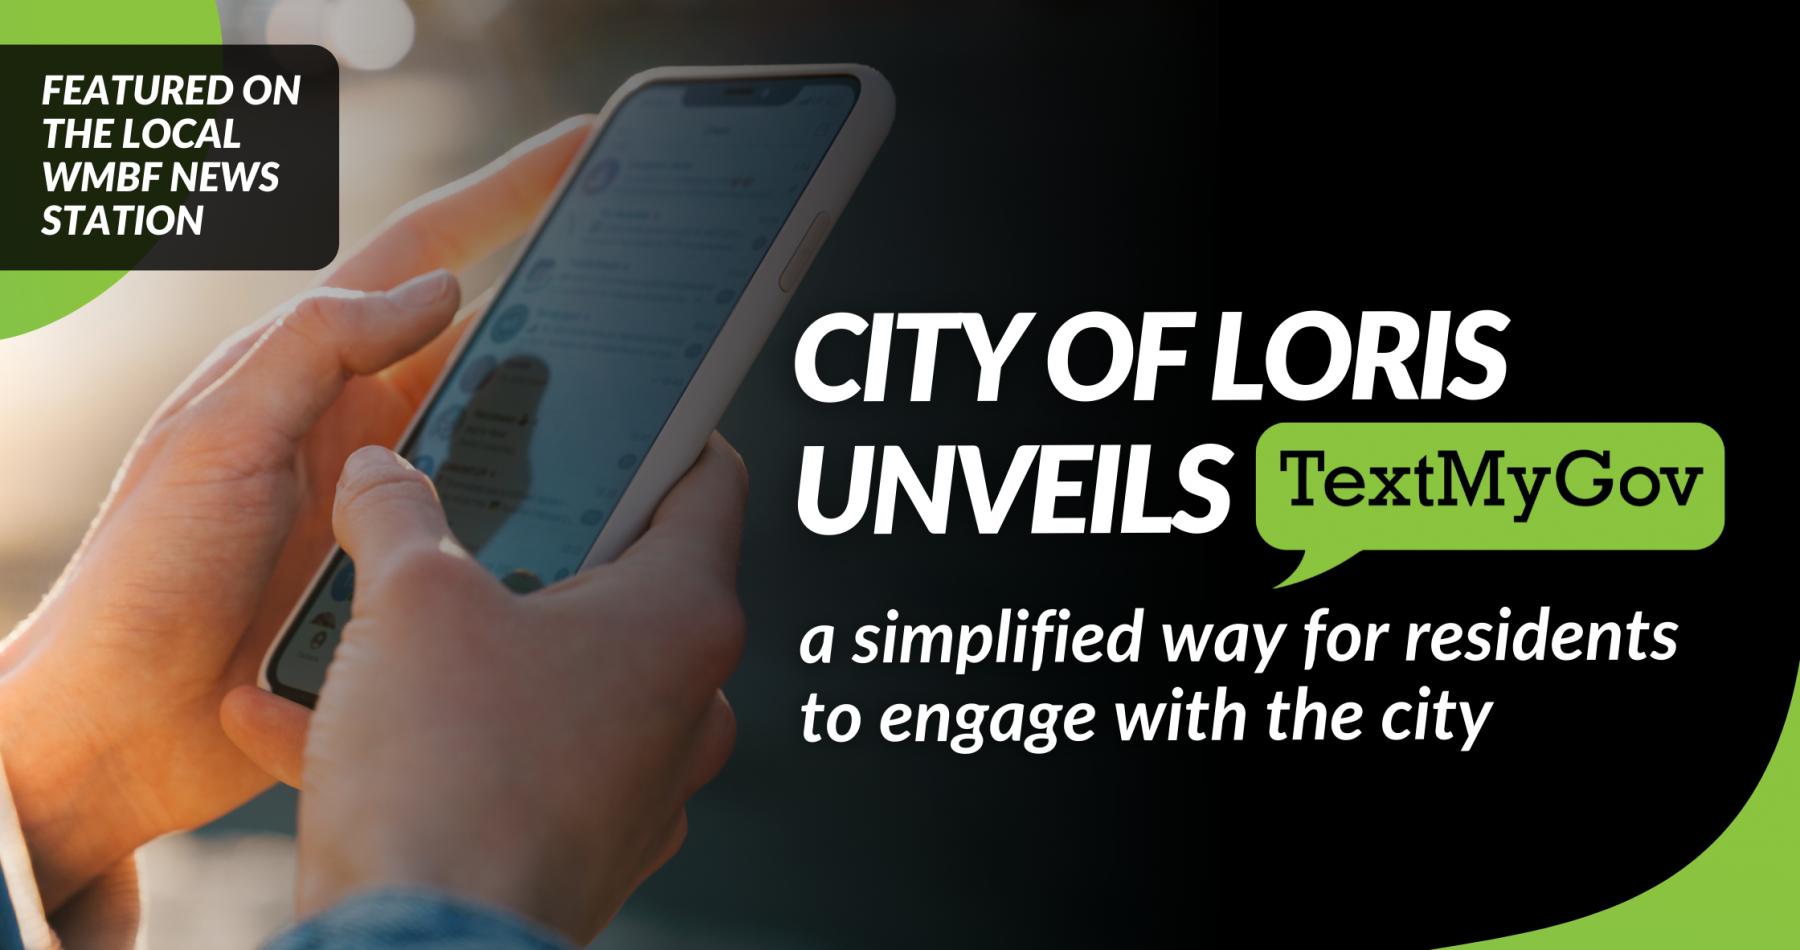 City of Loris unveils TextMyGov